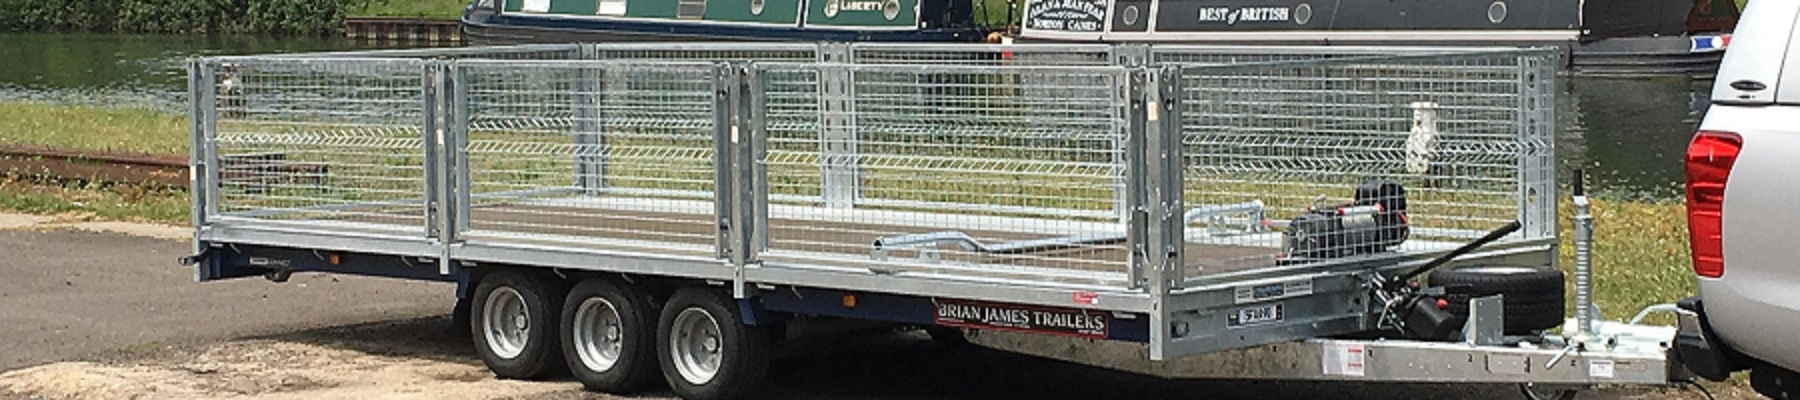 ENDE trailer transporter